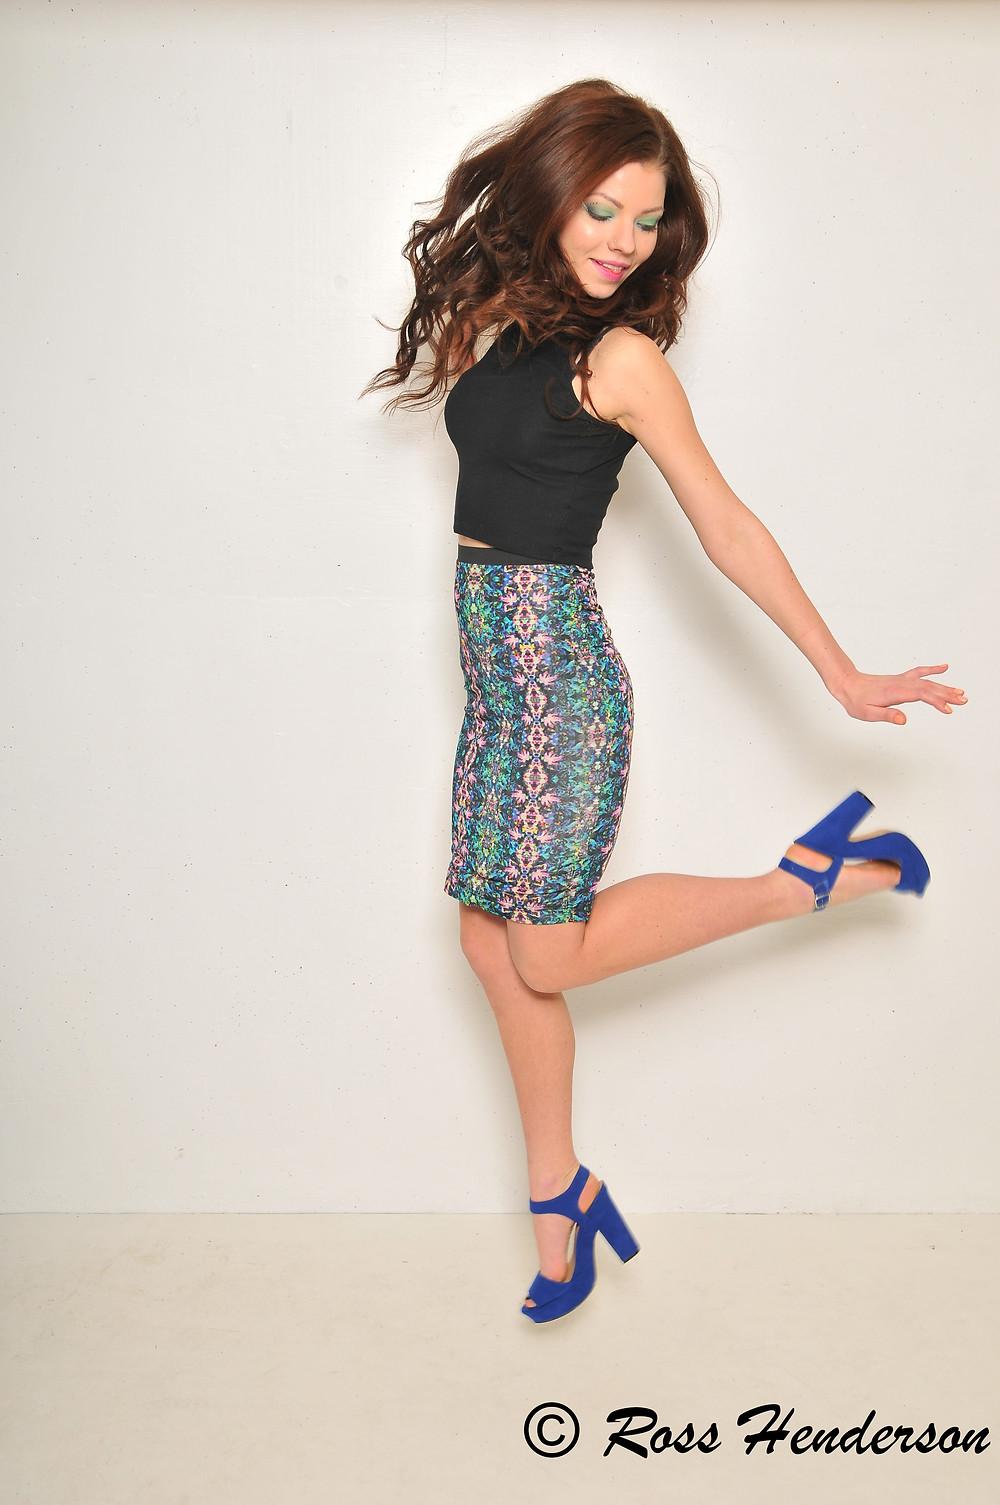 Fashion model jumping